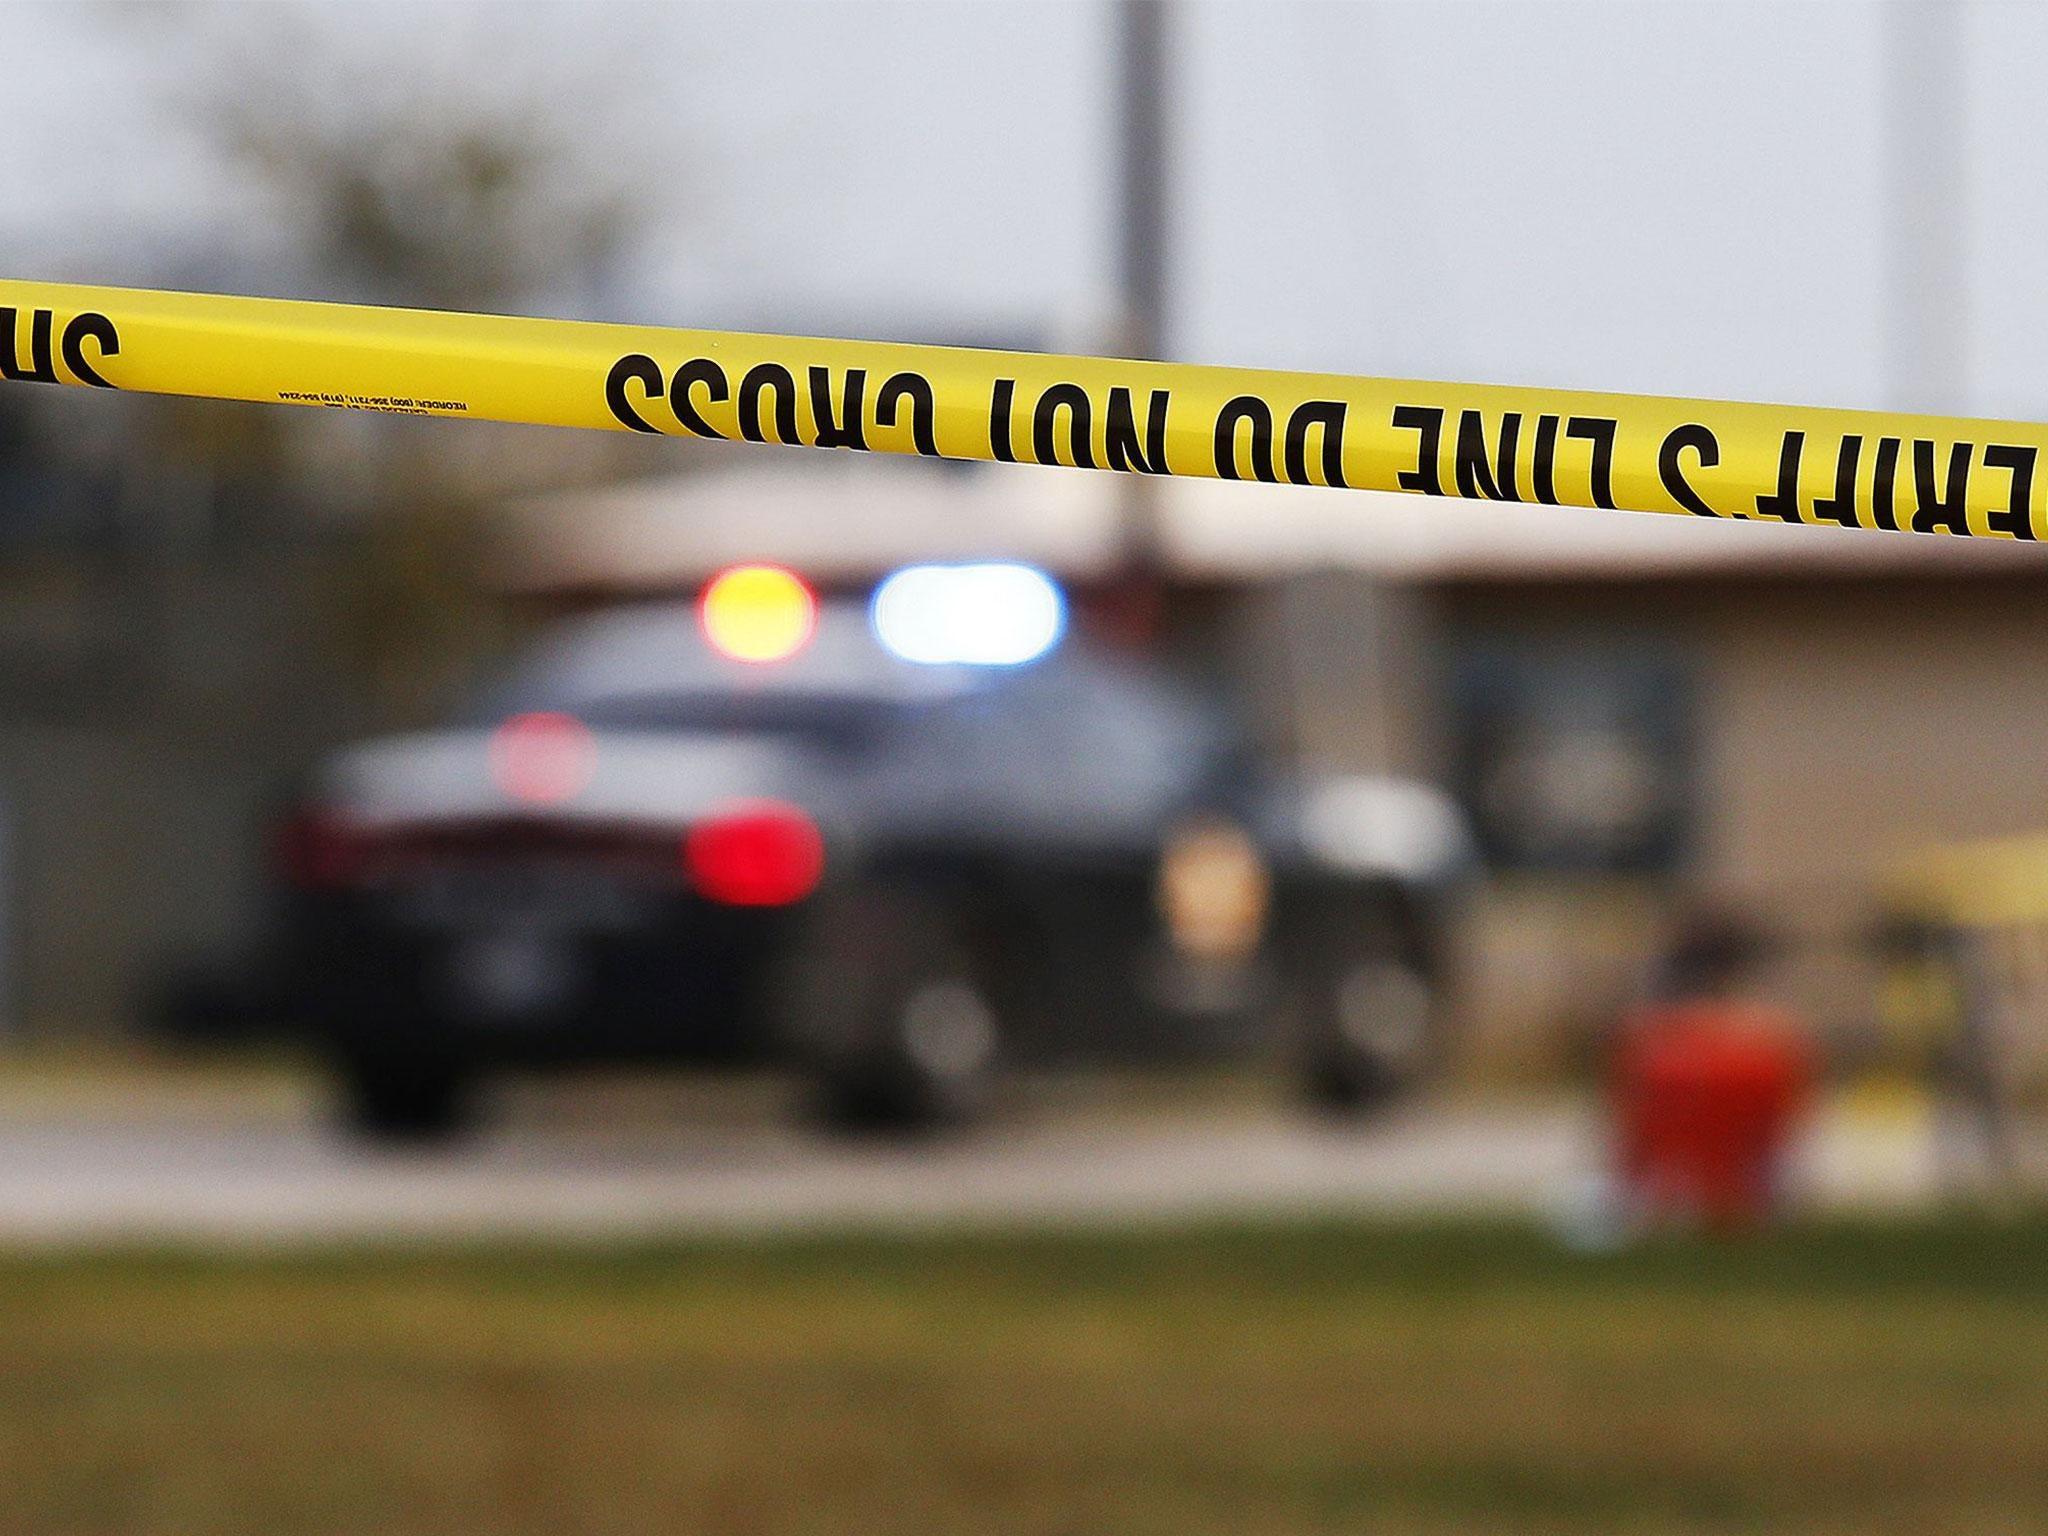 Five people killed in 'horrific' Kentucky shooting spree